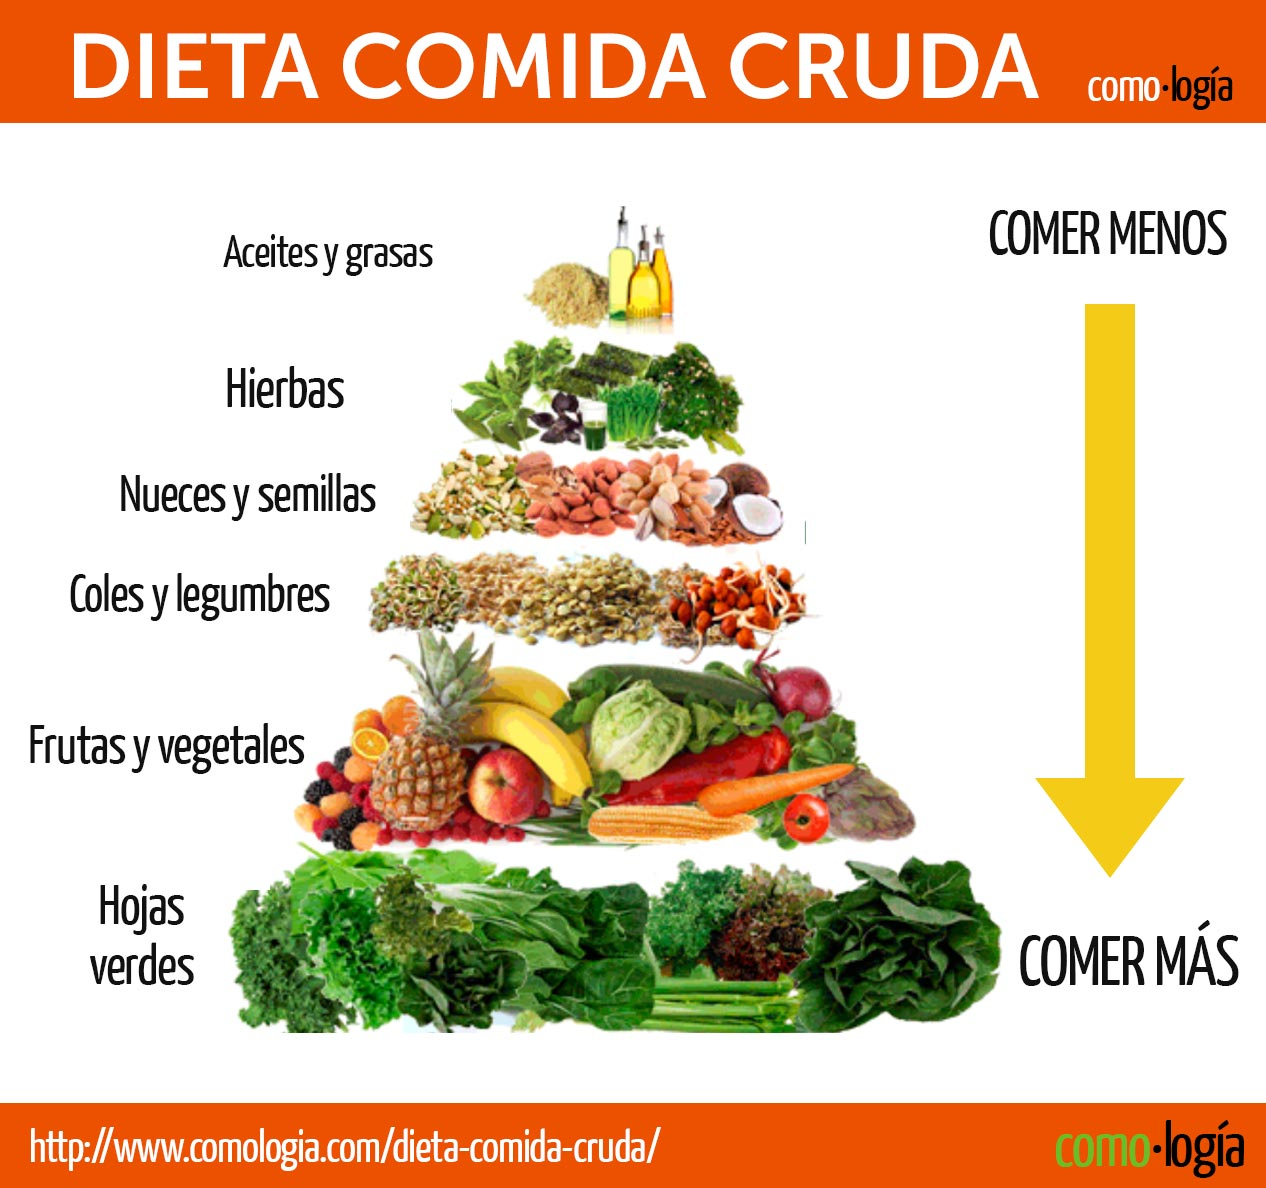 dieta de comida cruda adelgaza r pido comiendo alimentos